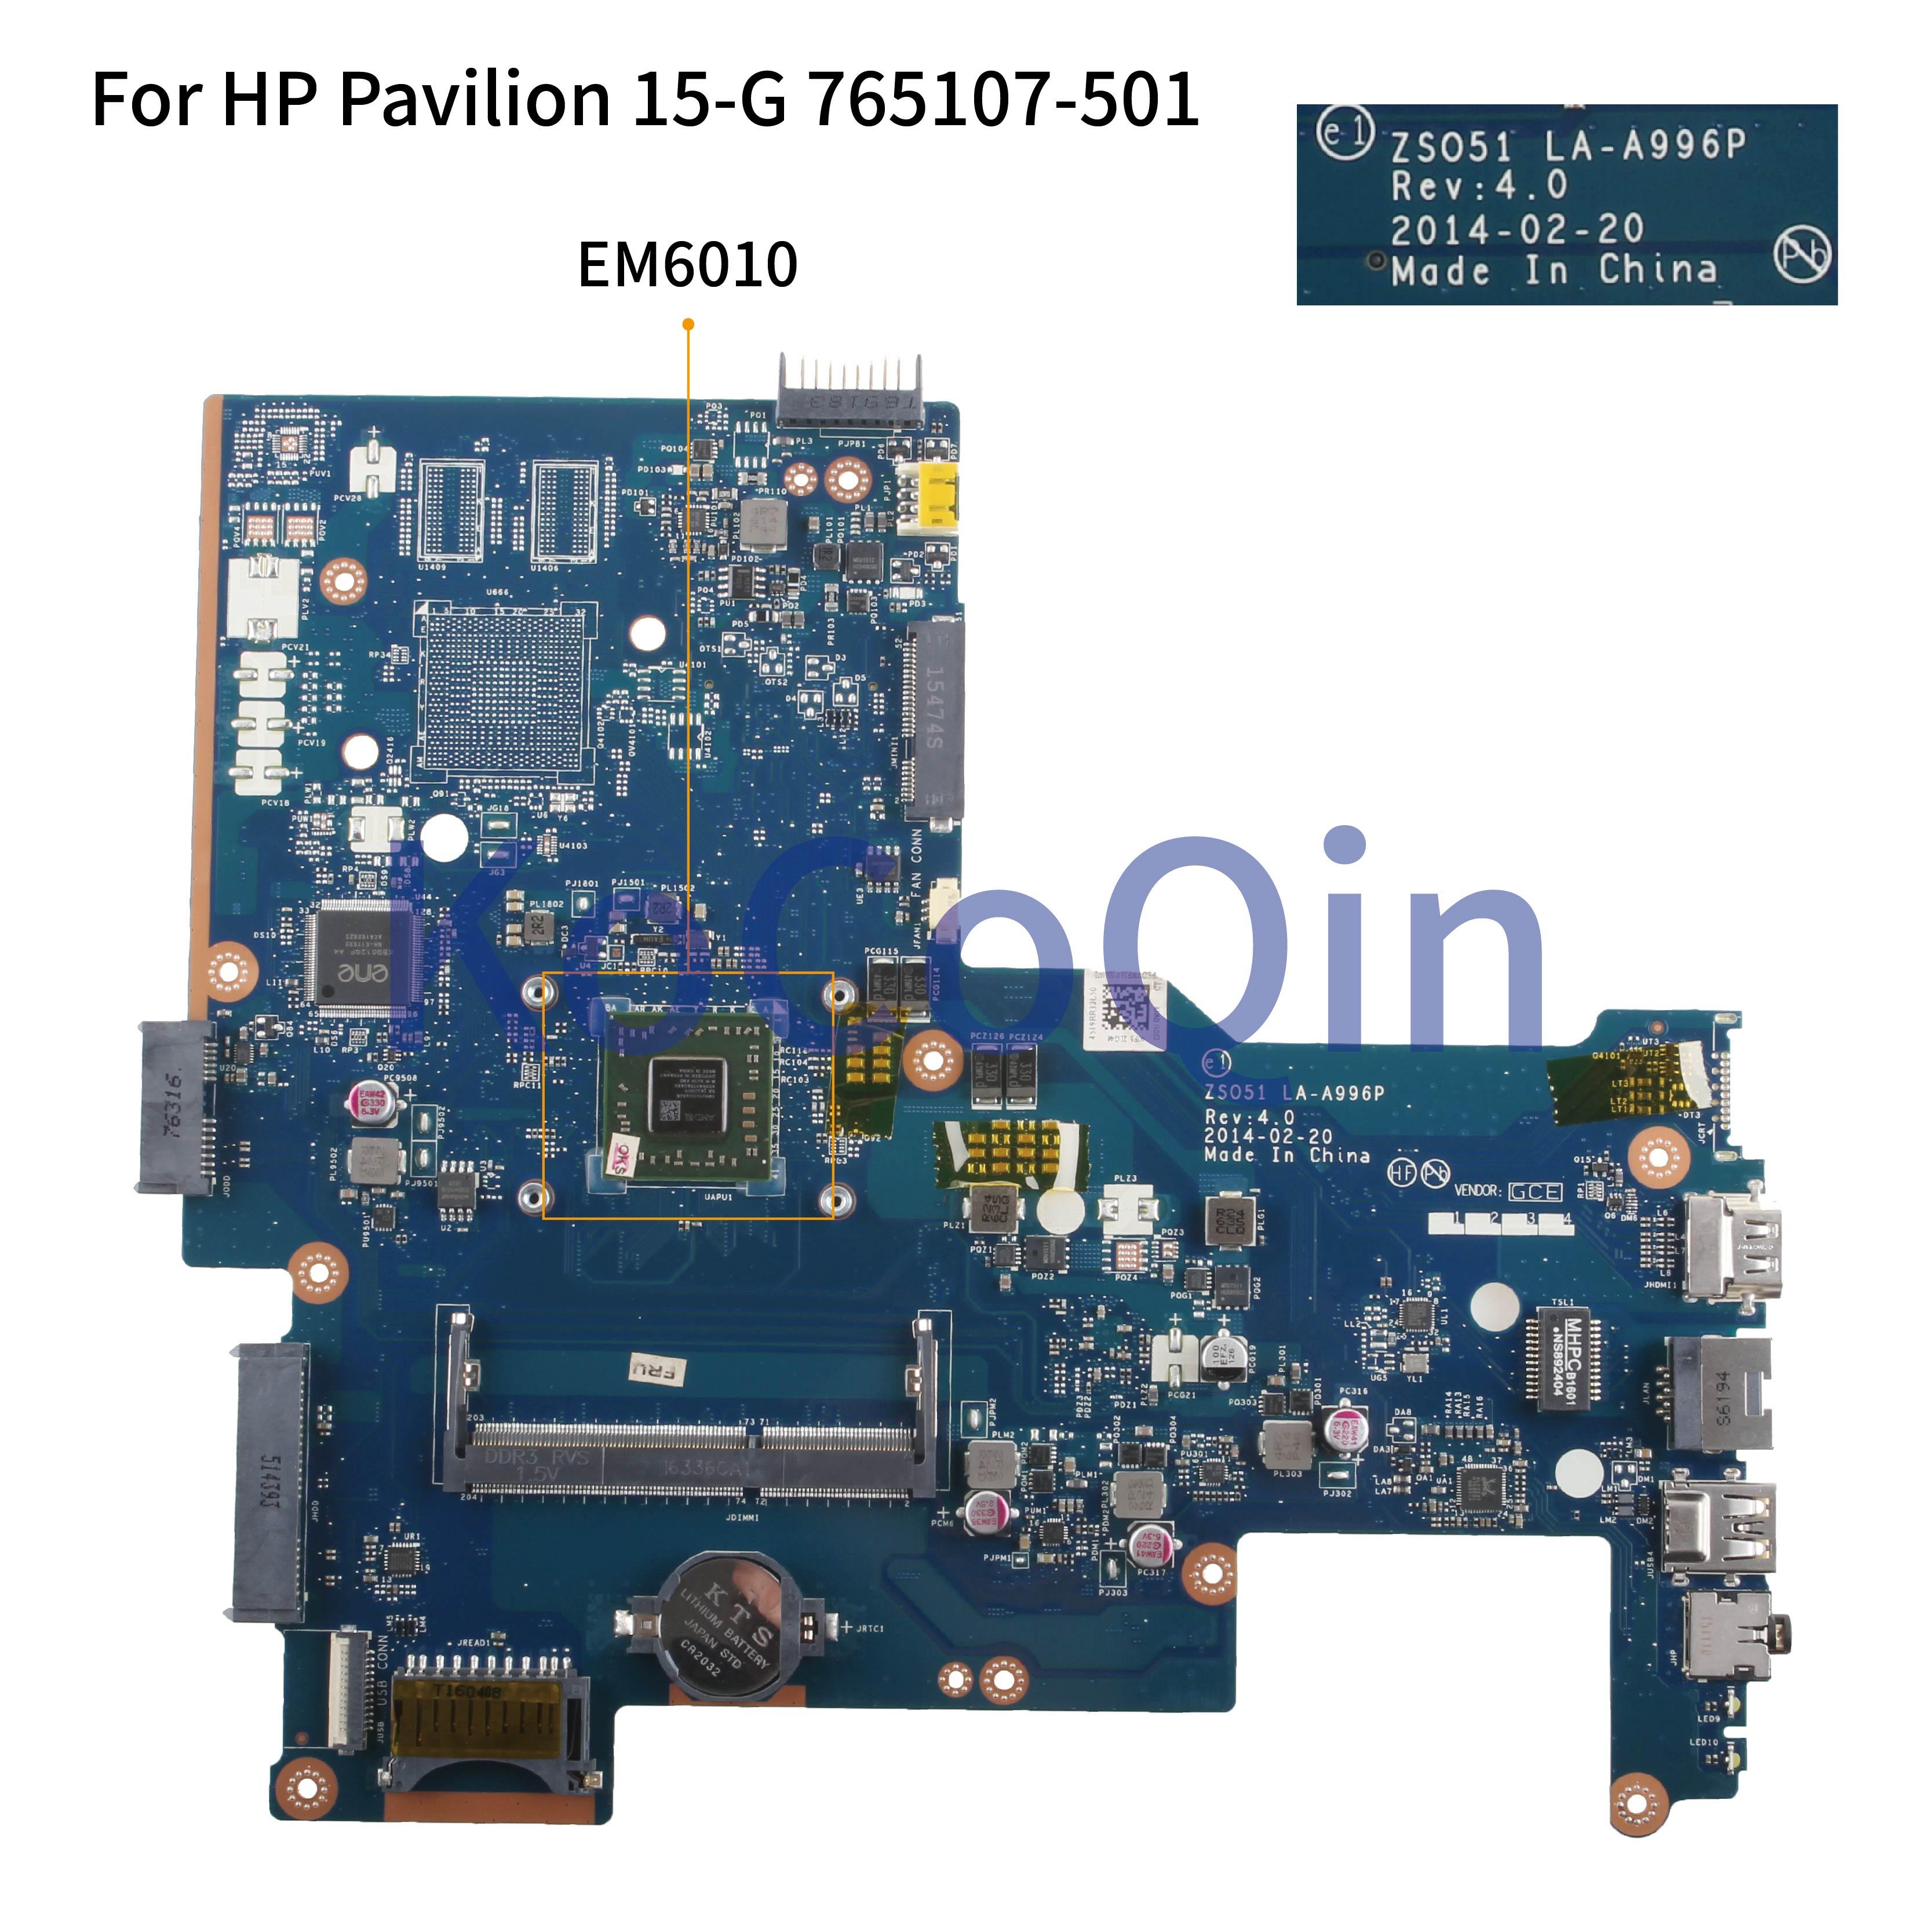 KoCoQin اللوحة الأم للكمبيوتر المحمول HP بافيليون 15-G 255 G3 EM6010 اللوحة الرئيسية 765107-001 765107-501 ZS051 LA-A996P وحدة المعالجة المركزية AMD